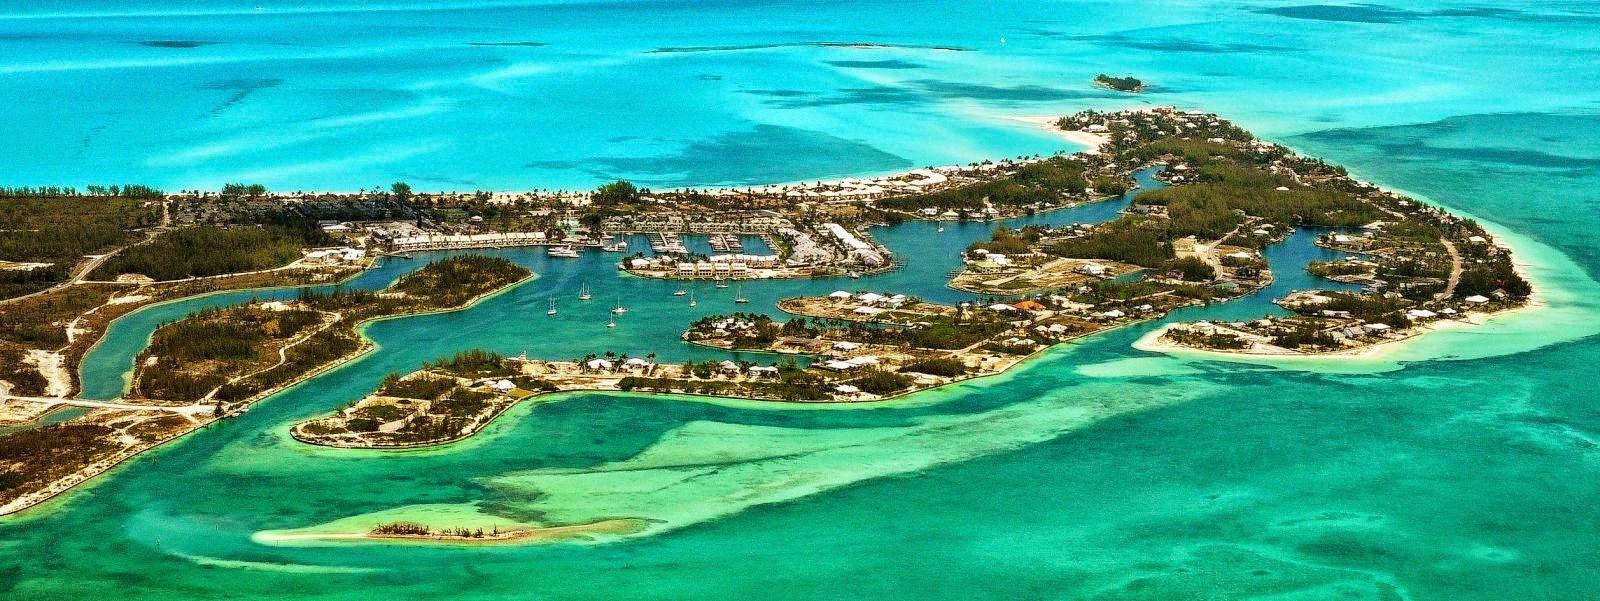 Abaco Islands Bahamas Beaches Best Beaches